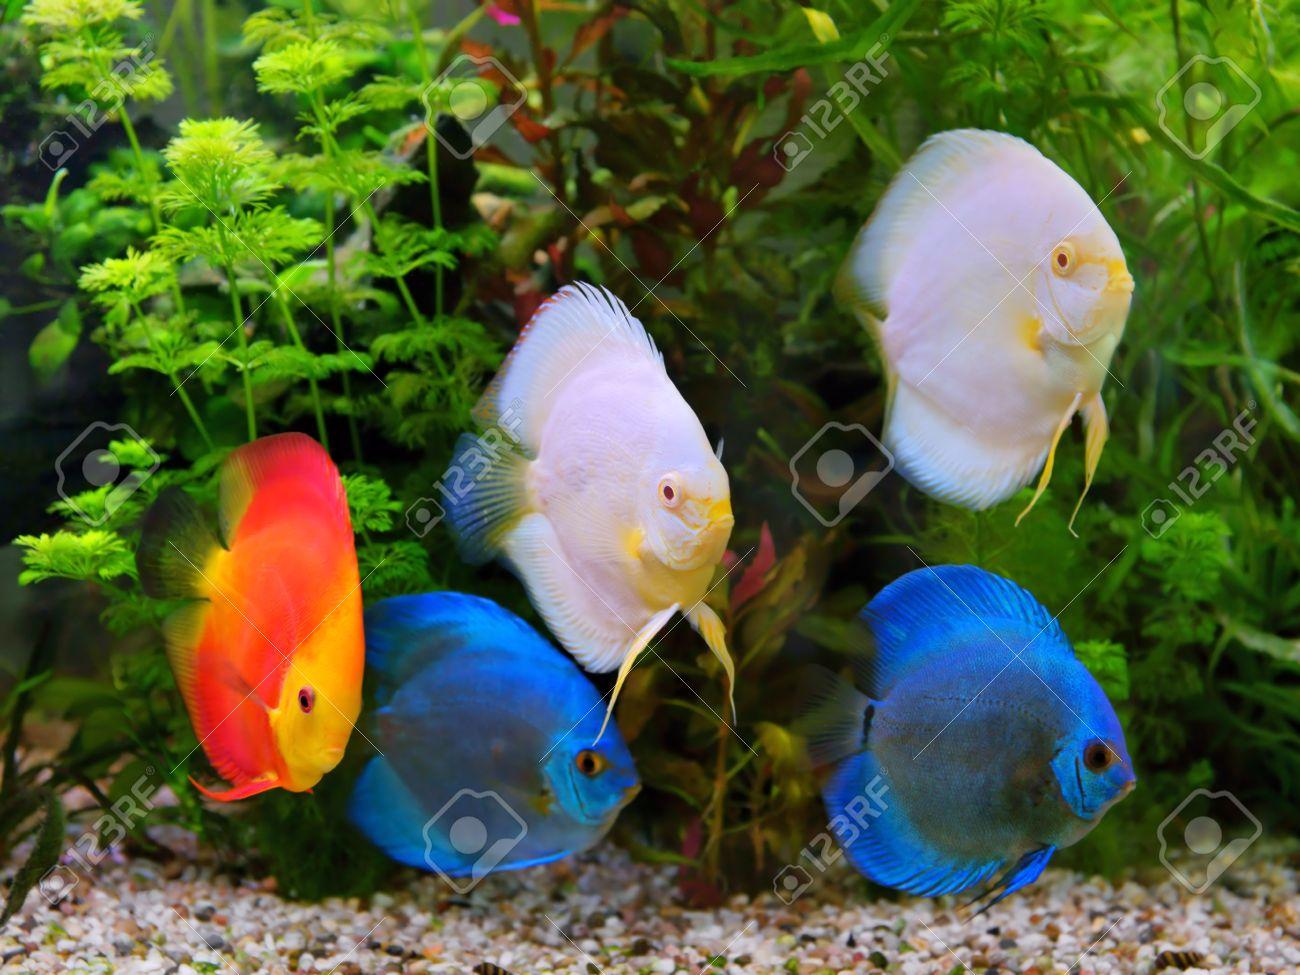 Freshwater aquarium fish cichlids - Discus Symphysodon Multi Colored Cichlids In The Aquarium The Freshwater Fish Native To